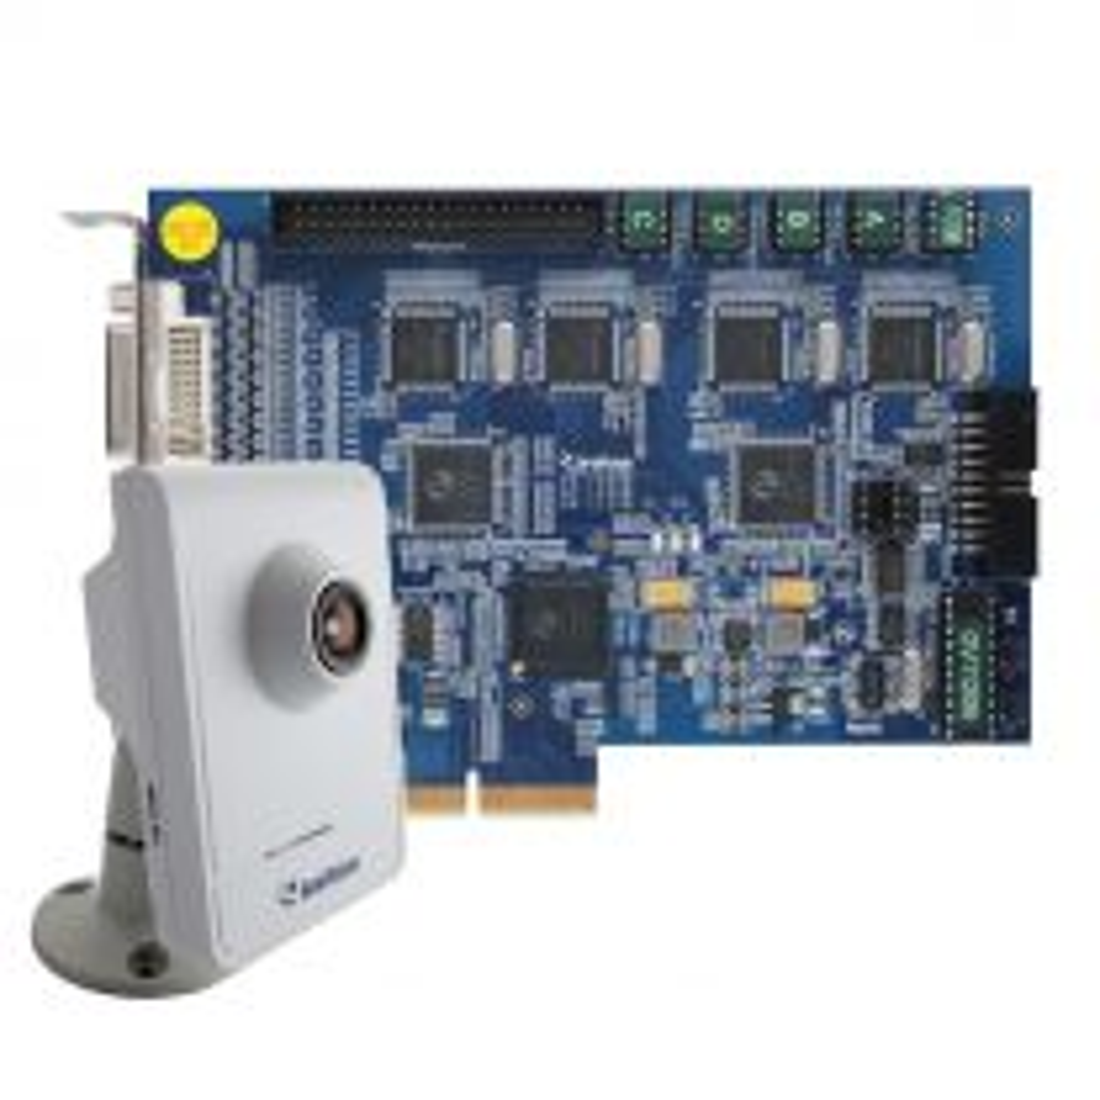 GeoVision GV-1240B-16 + GV-CB120 • 16 channel hybrid video capture card + IP camera GV-CB120